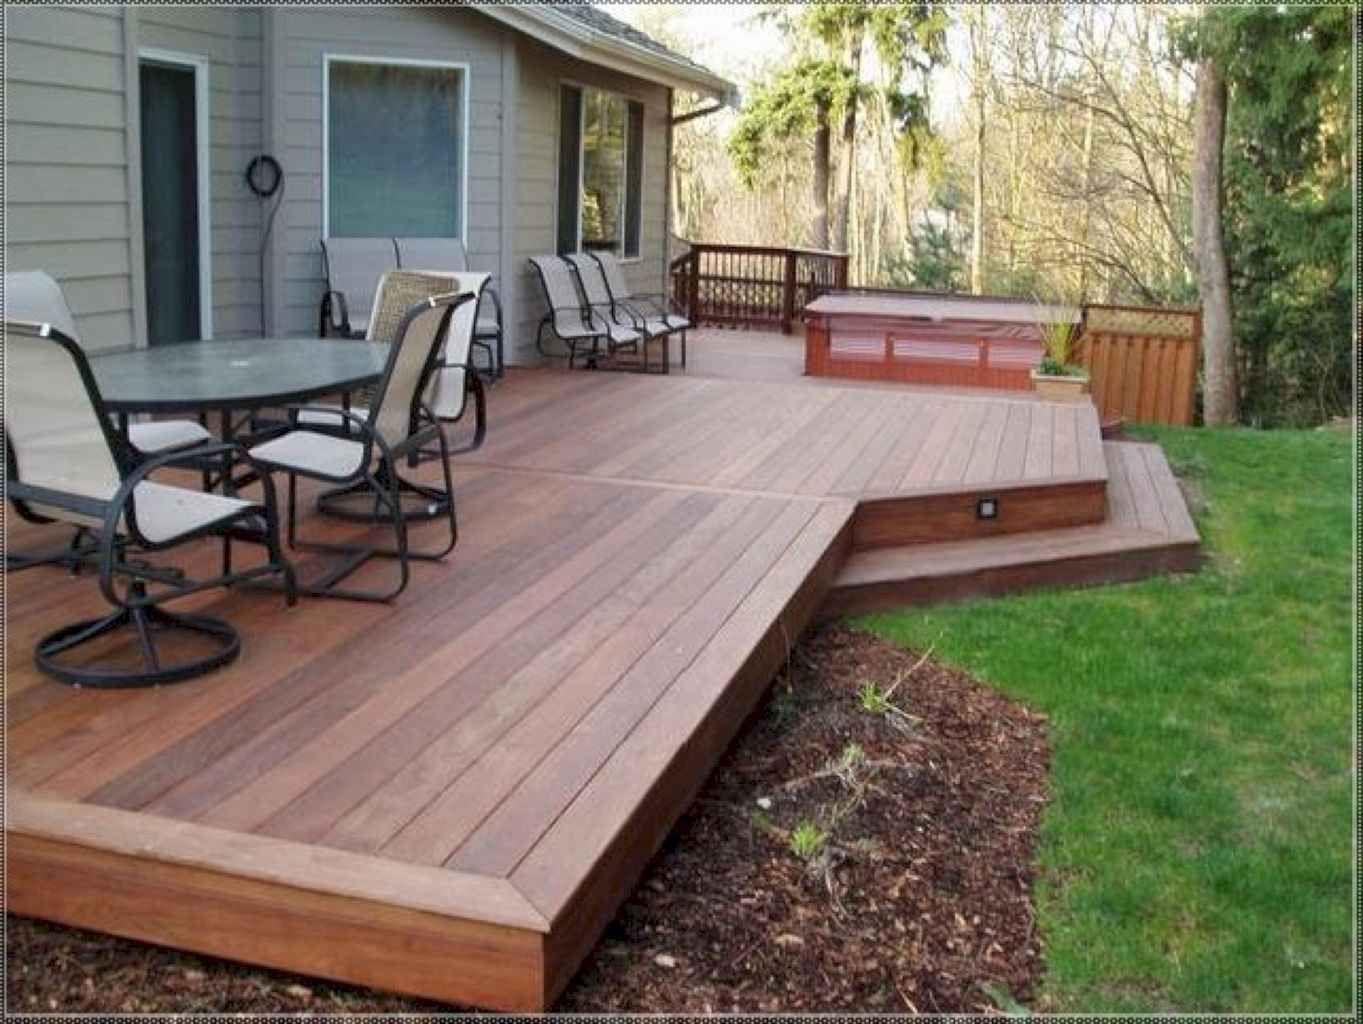 60 Awesome Small Backyard Patio Design Ideas Backyardpatiodesigns The National Trend Toward Smaller Home Deck Designs Backyard Patio Deck Designs Patio Design